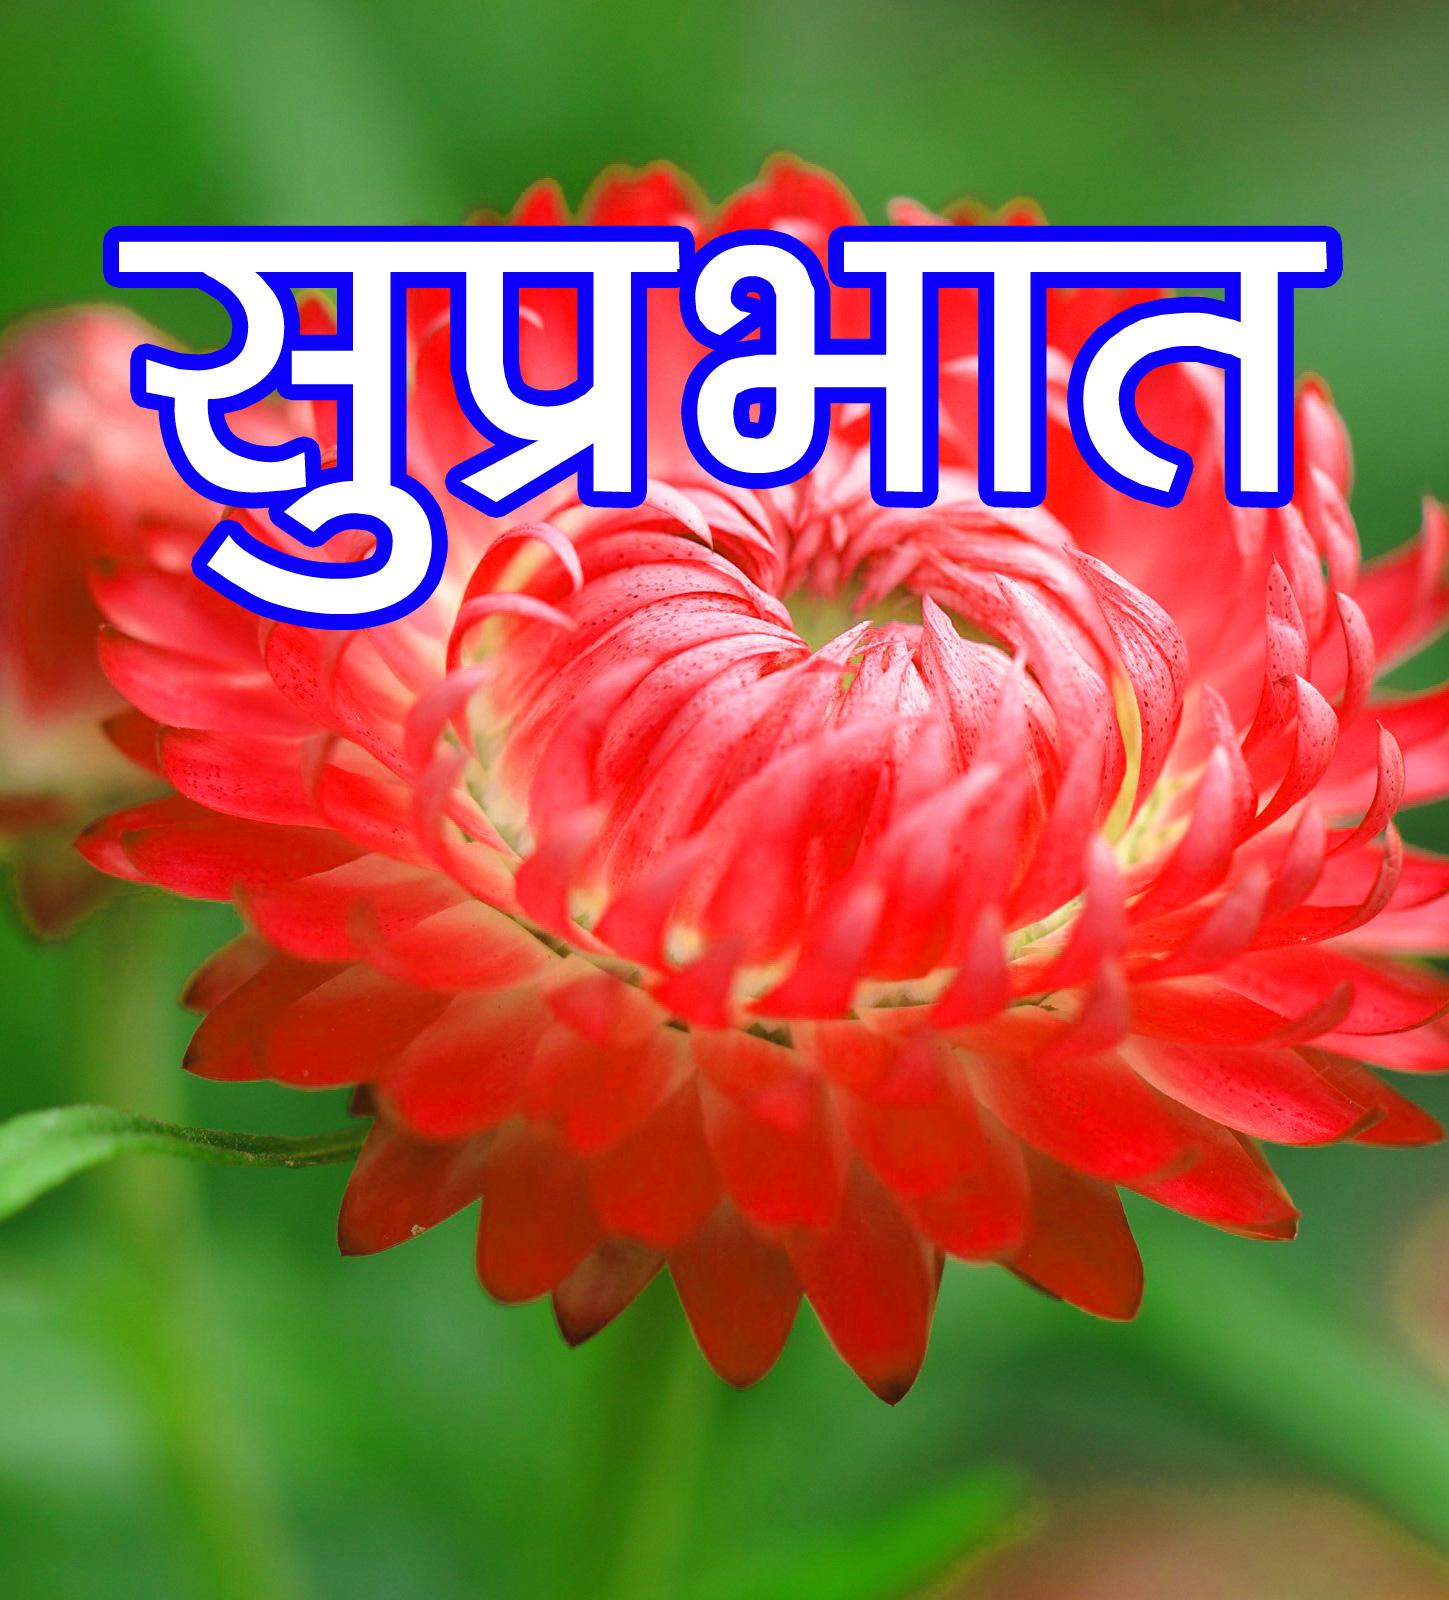 flower good morning images Wallpaper Free